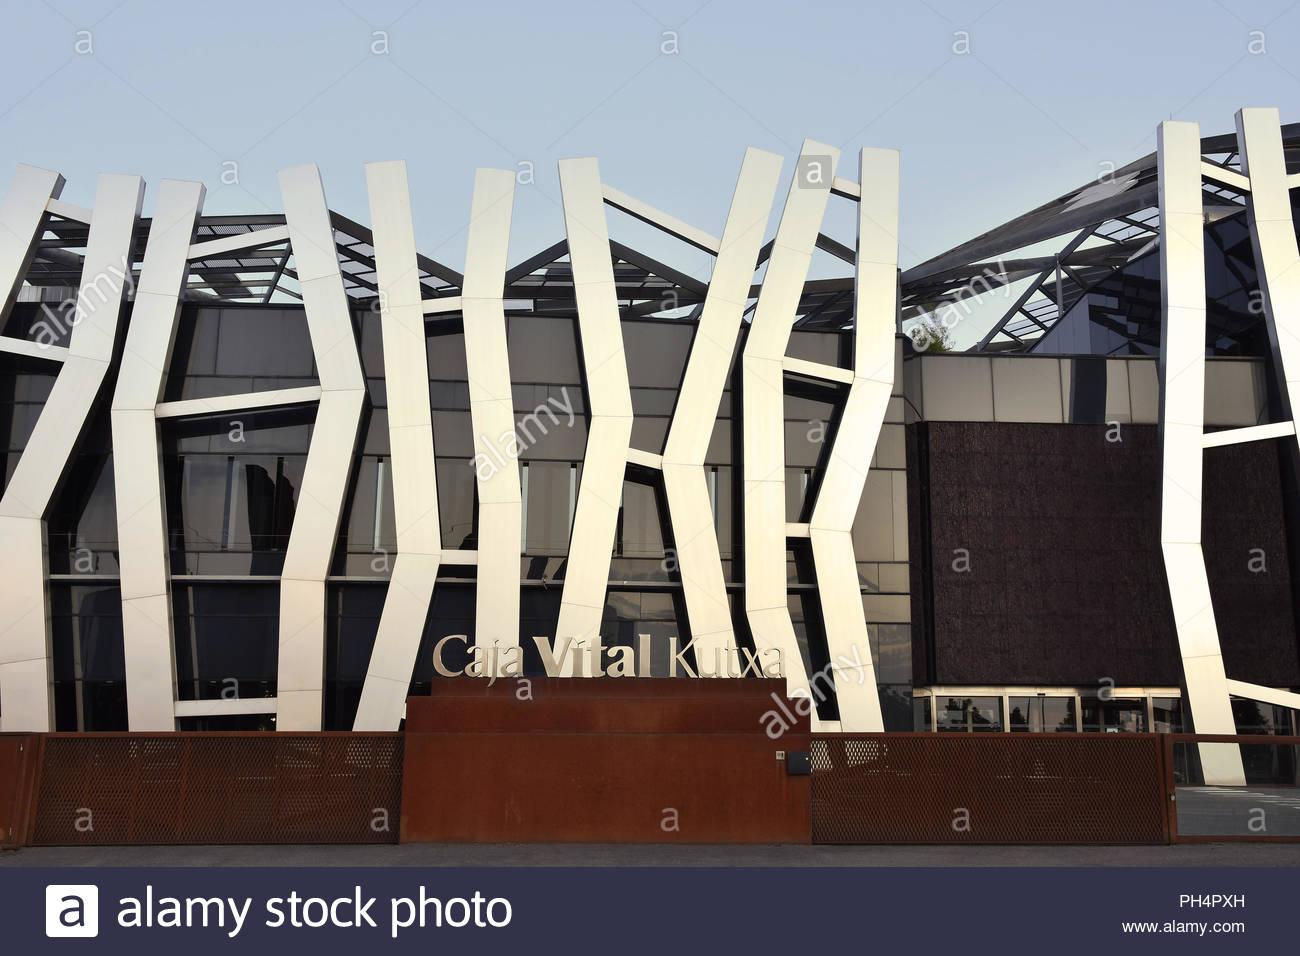 Caja Vital Kutxa bank - modern building exterior steel facade cladding. Designed by Mozas Aguirre architects in Vitoria-Gasteiz Spain Europe. - Stock Image